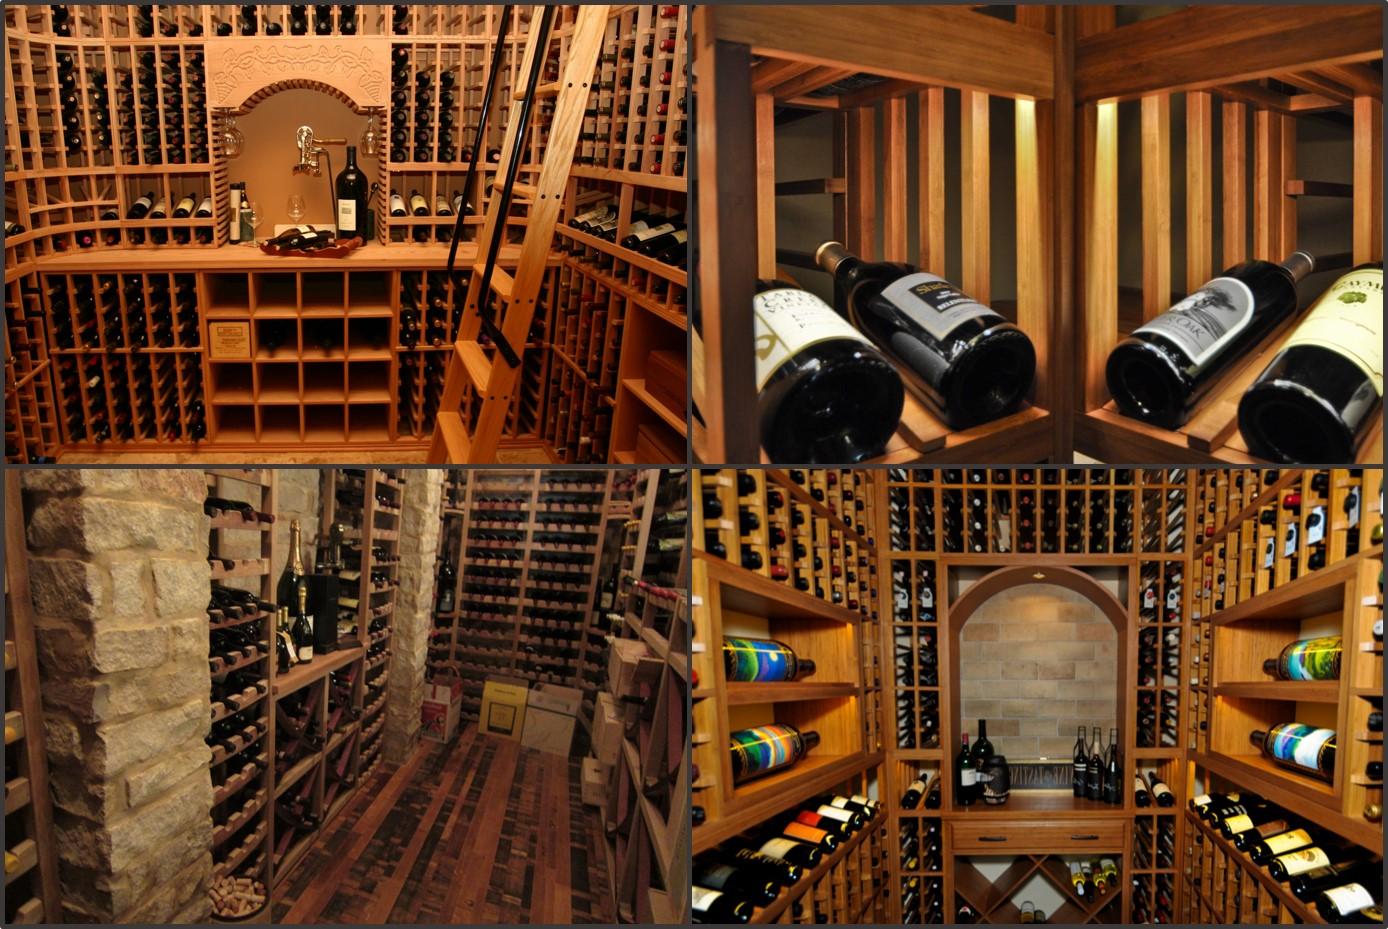 Specialist Wine Cellar Construction